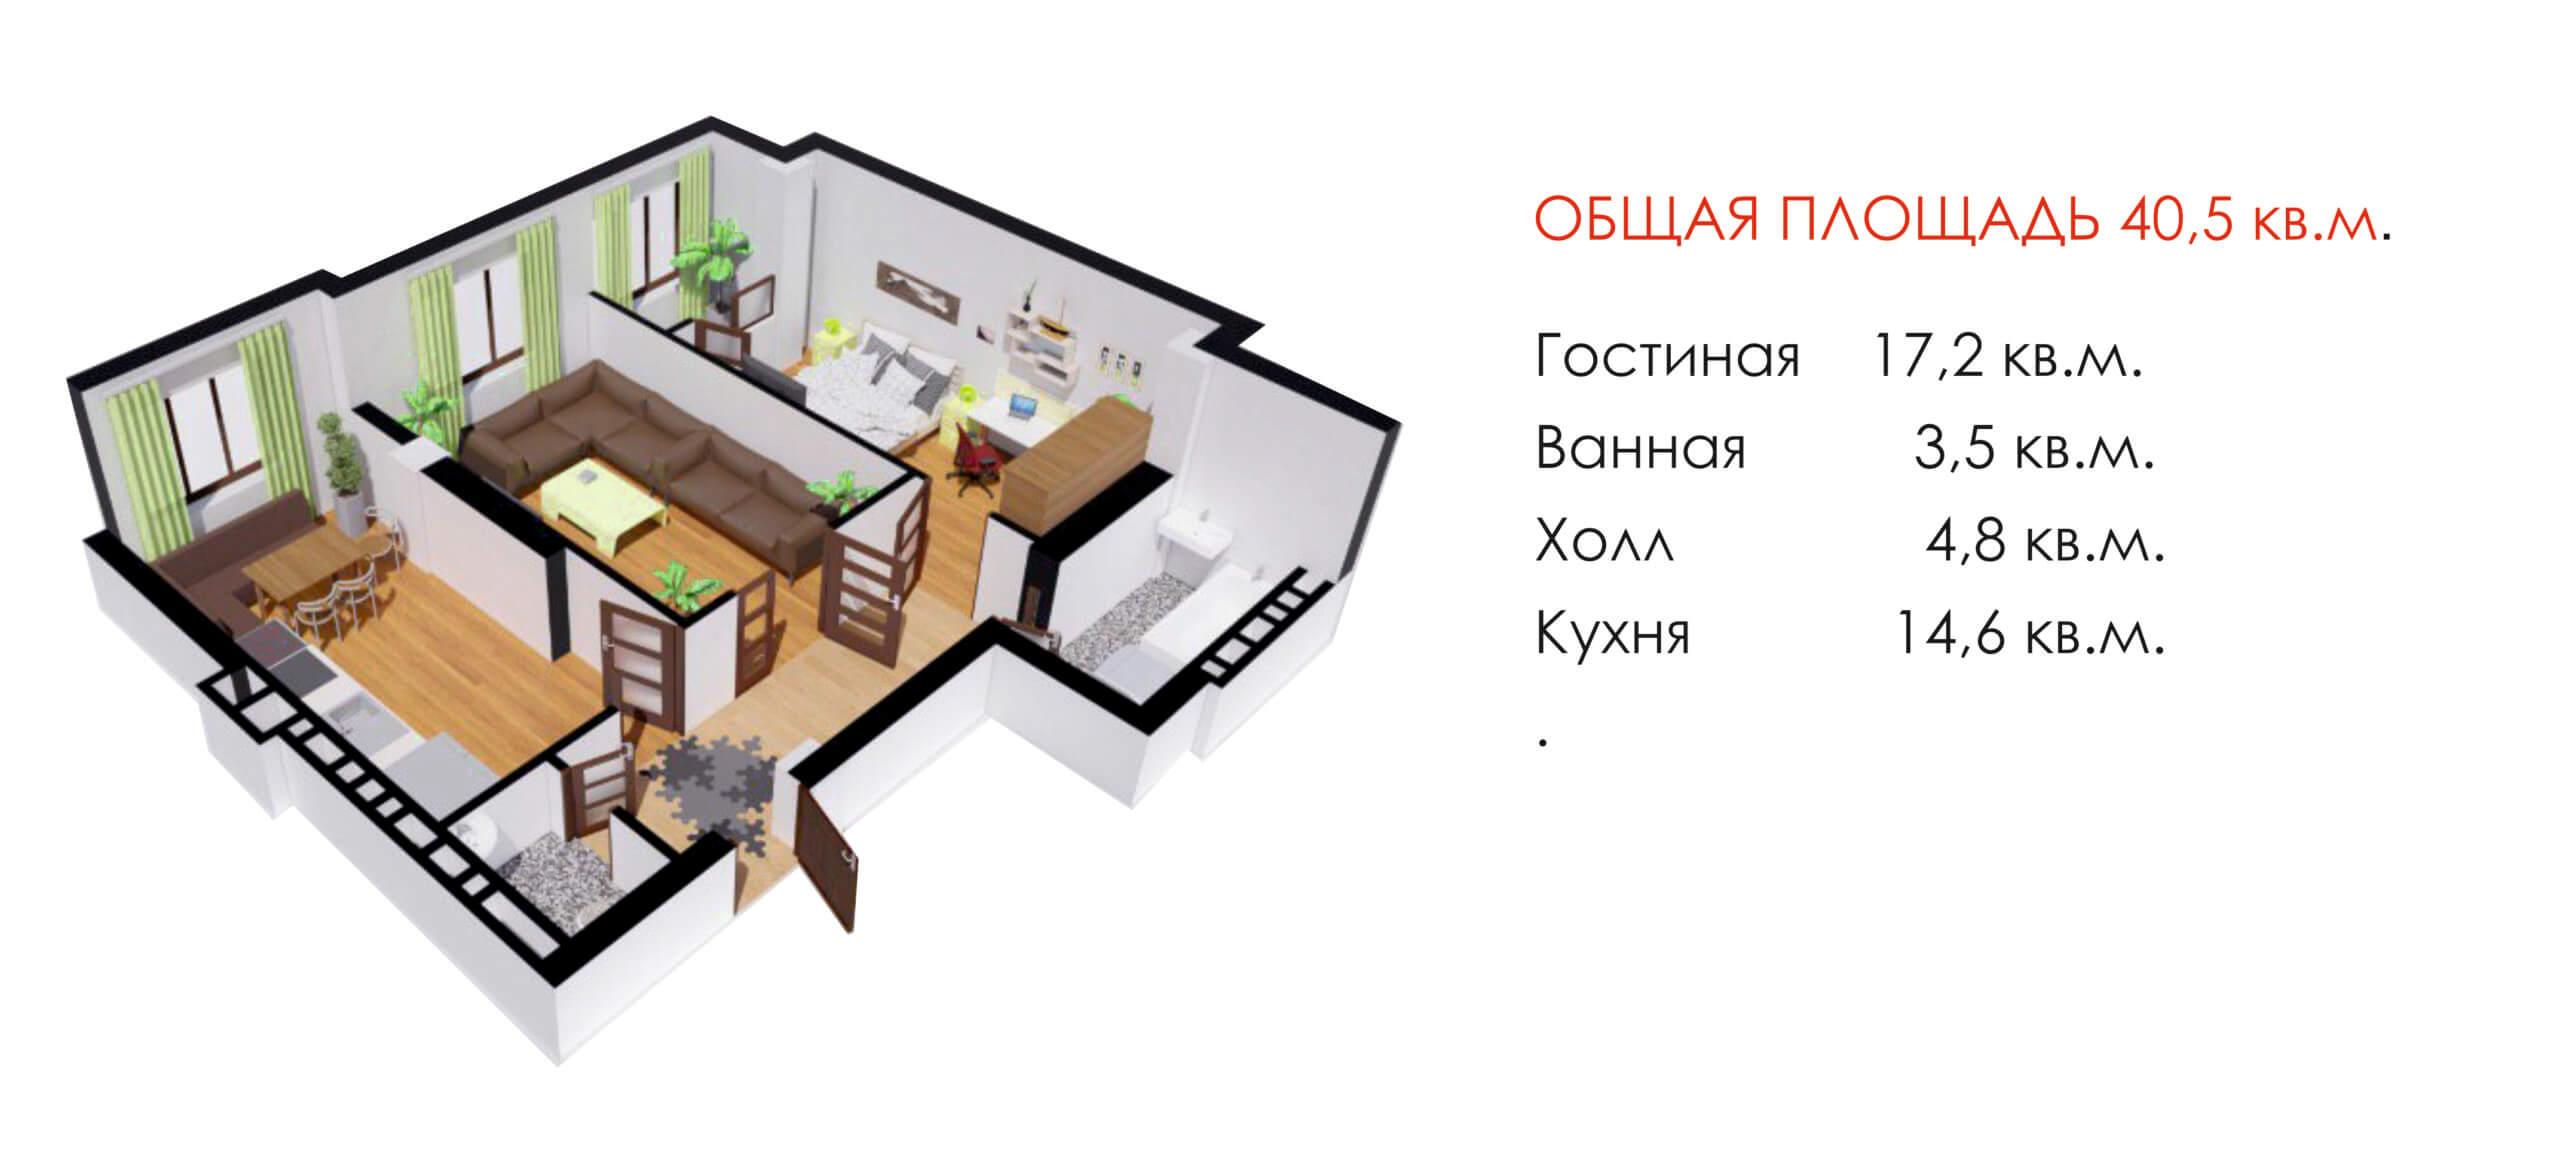 Однокомнатная квартира 40,5 кв.м.